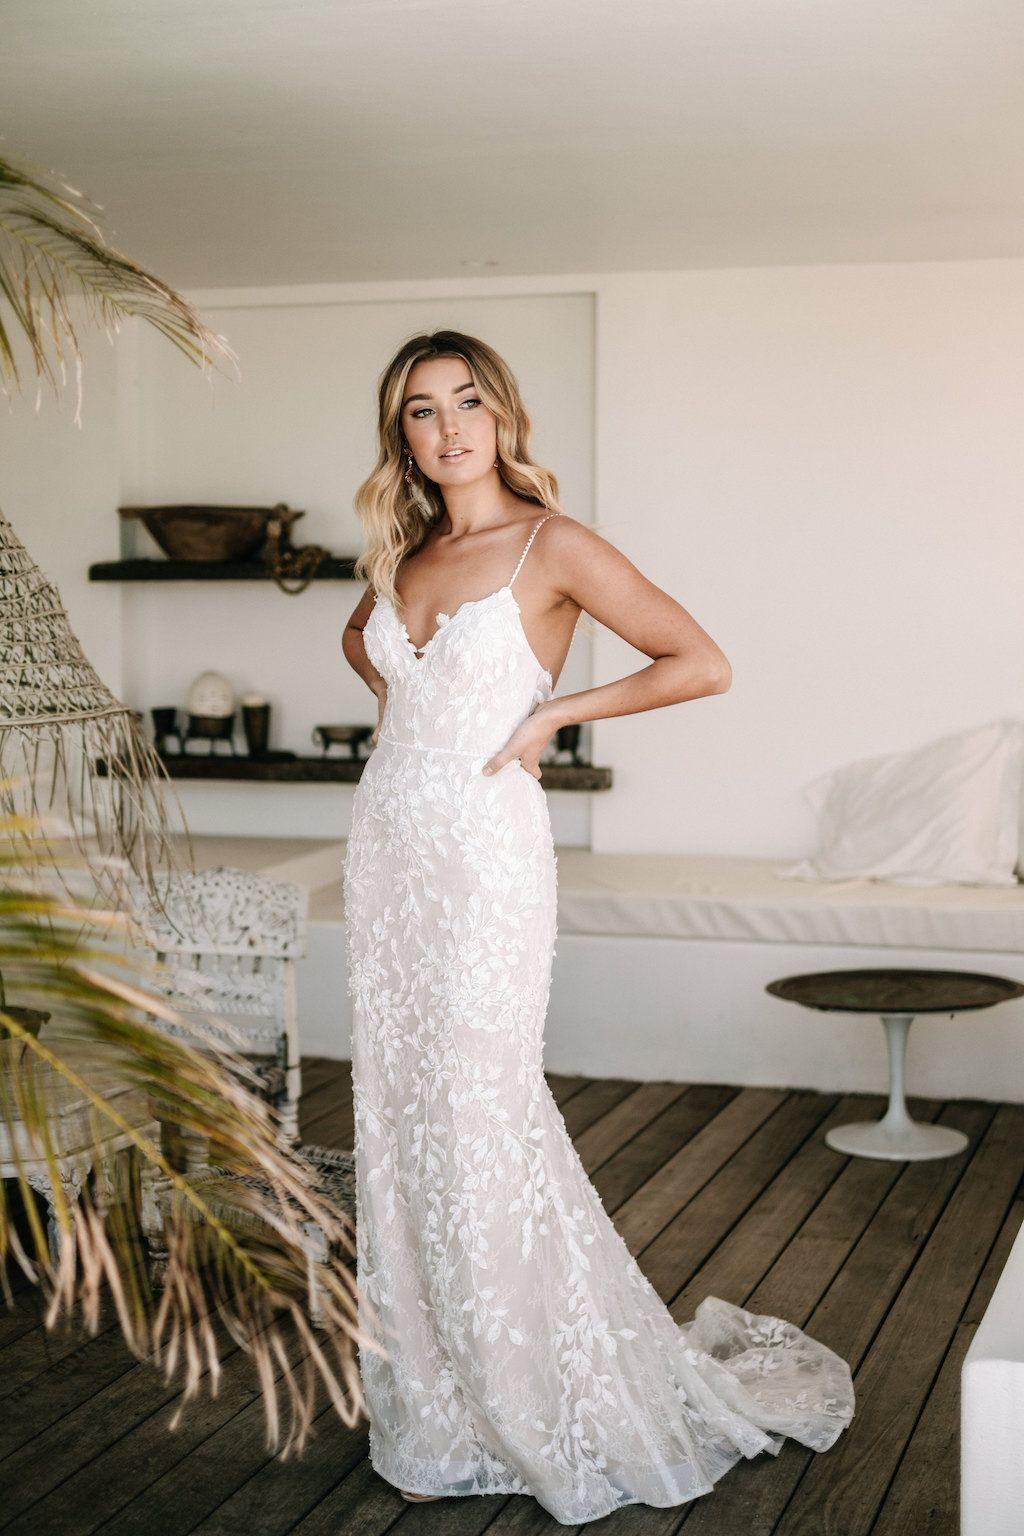 Https Www Janehill Com Au Wp Content Uploads 2018 09 Janehill 10 3 Jpg Modern Wedding Dress Fit And Flare Wedding Dress Short Wedding Dress [ 1536 x 1024 Pixel ]